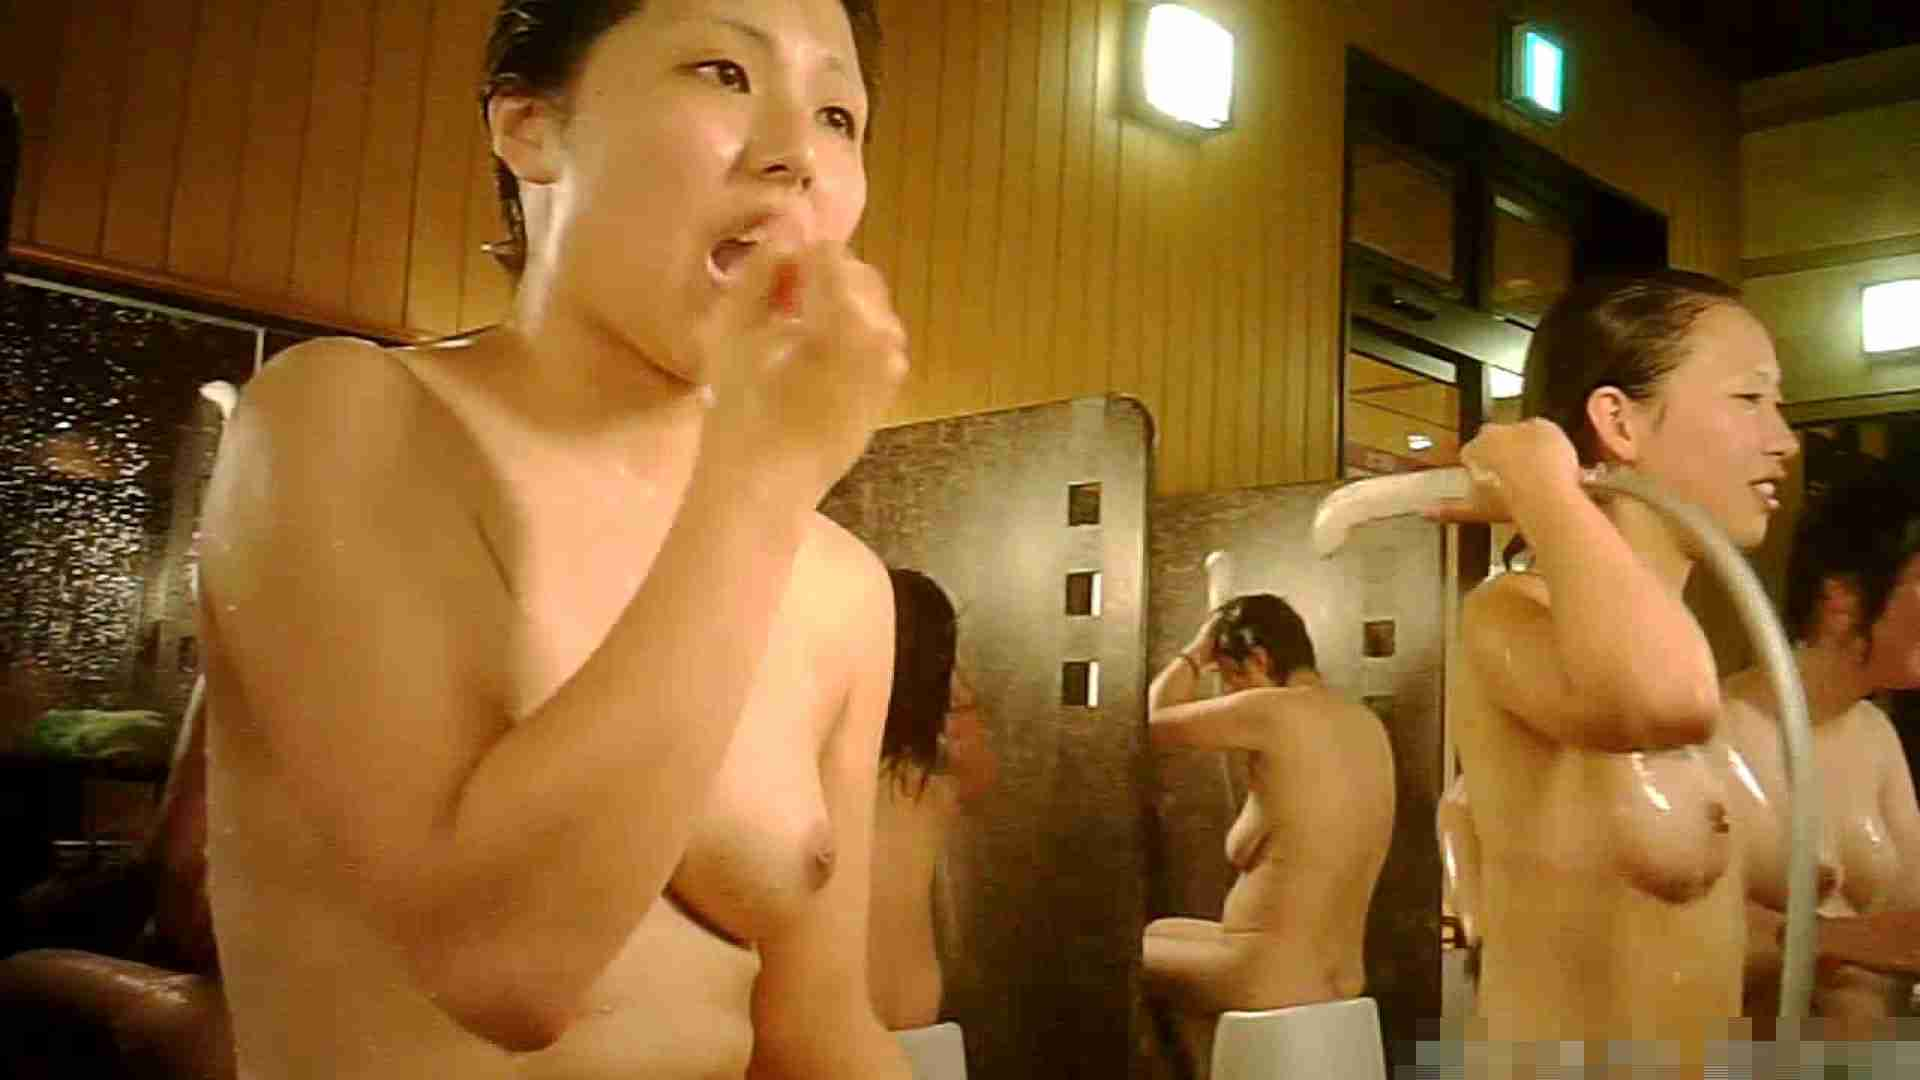 No.7 洗い場!!最近の嬢はオッパイ綺麗です。こちらも8個! 盛合せ AV無料動画キャプチャ 93枚 93